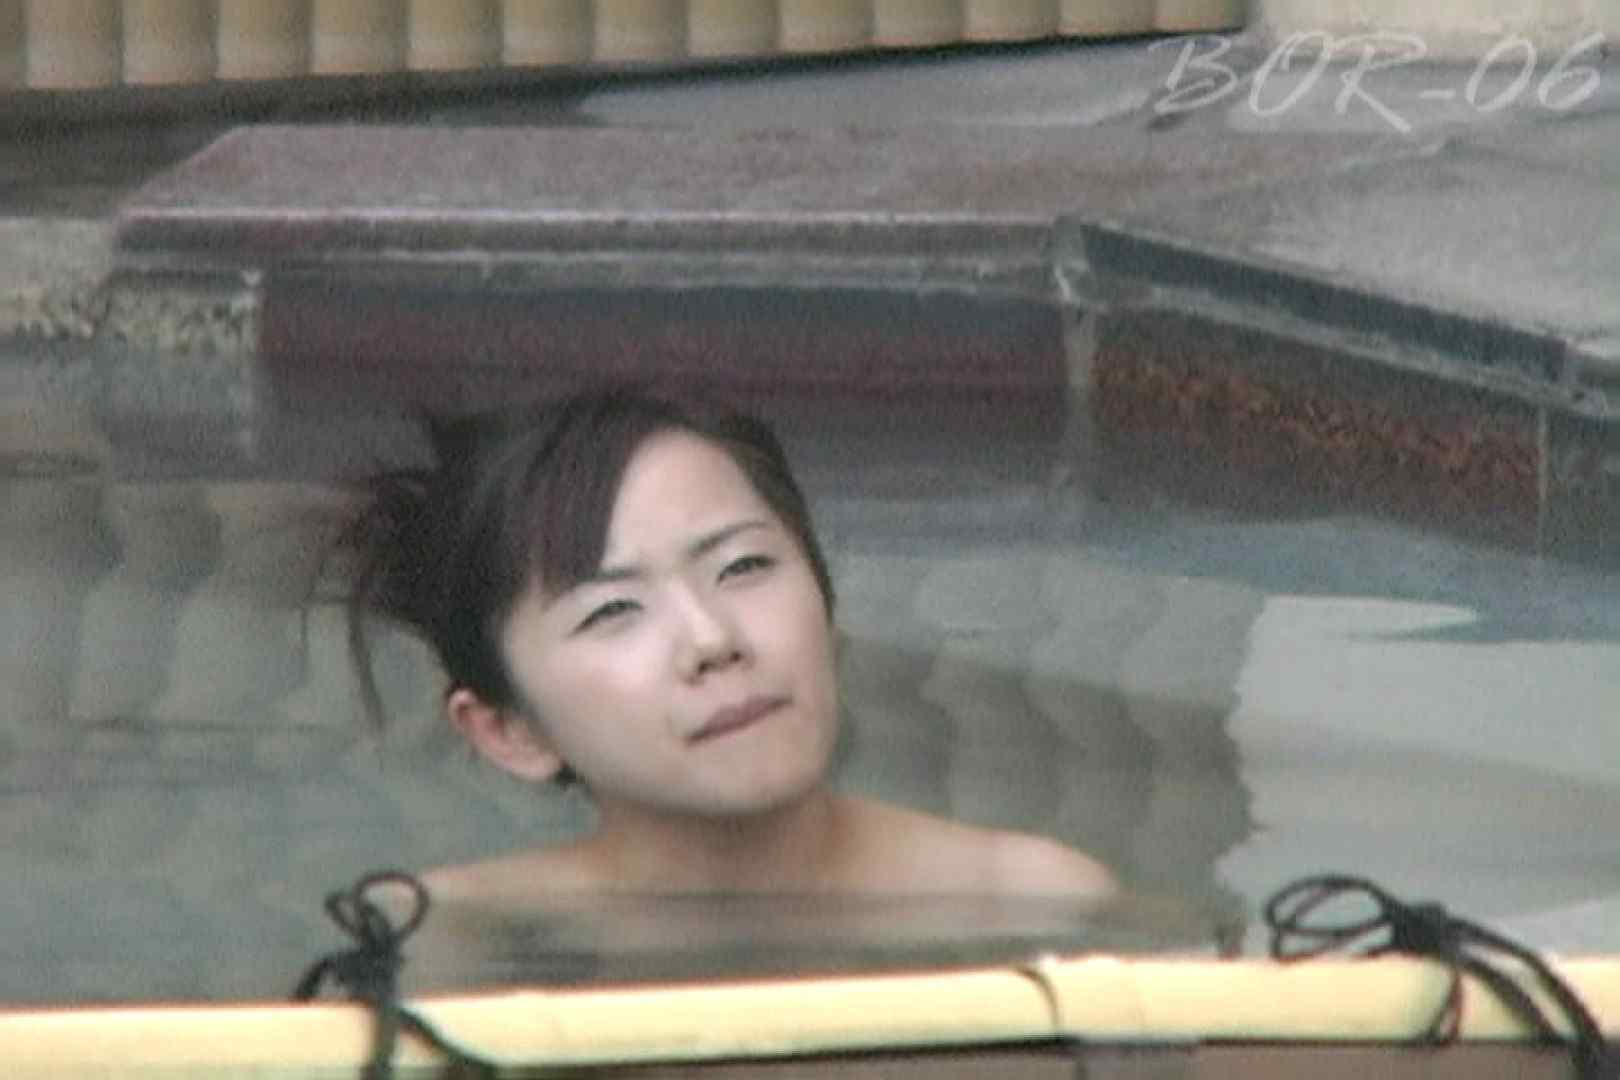 Aquaな露天風呂Vol.521 OLセックス | 盗撮  92画像 55